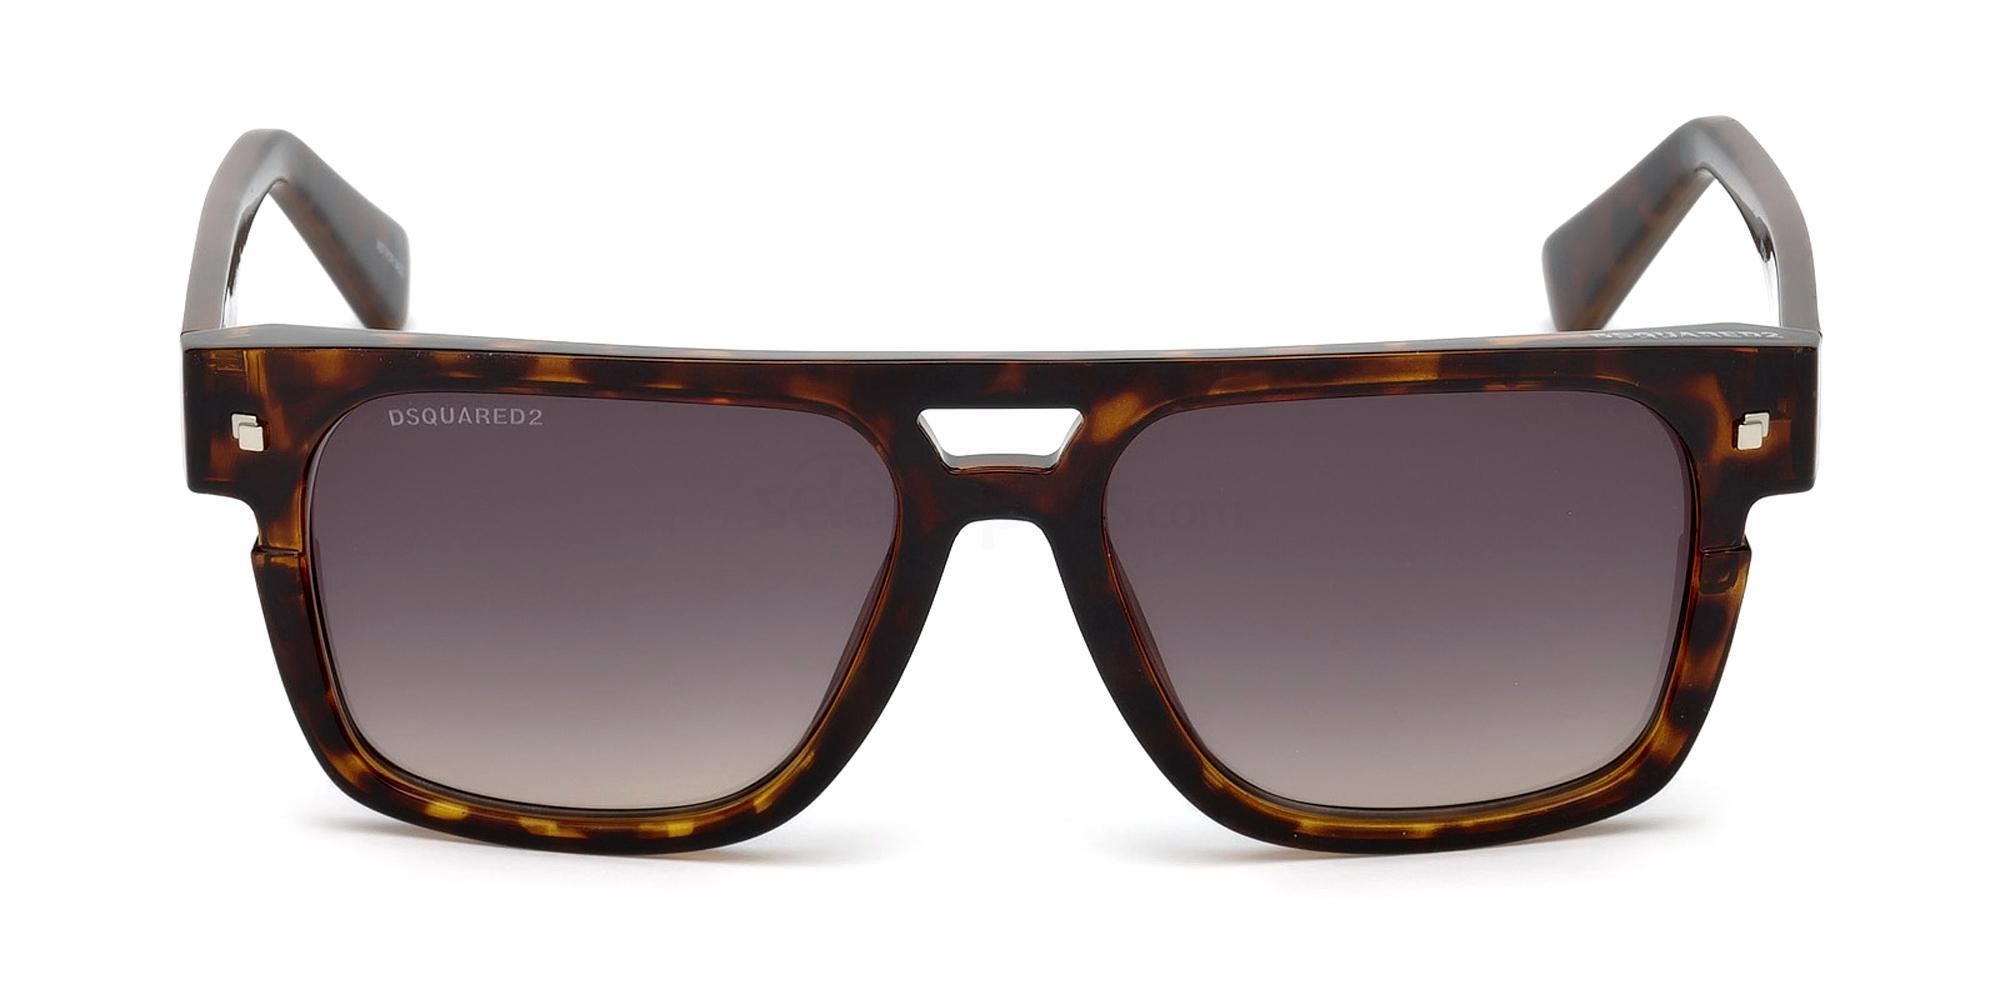 52B DQ0294 VICTOR Sunglasses, DSQUARED2